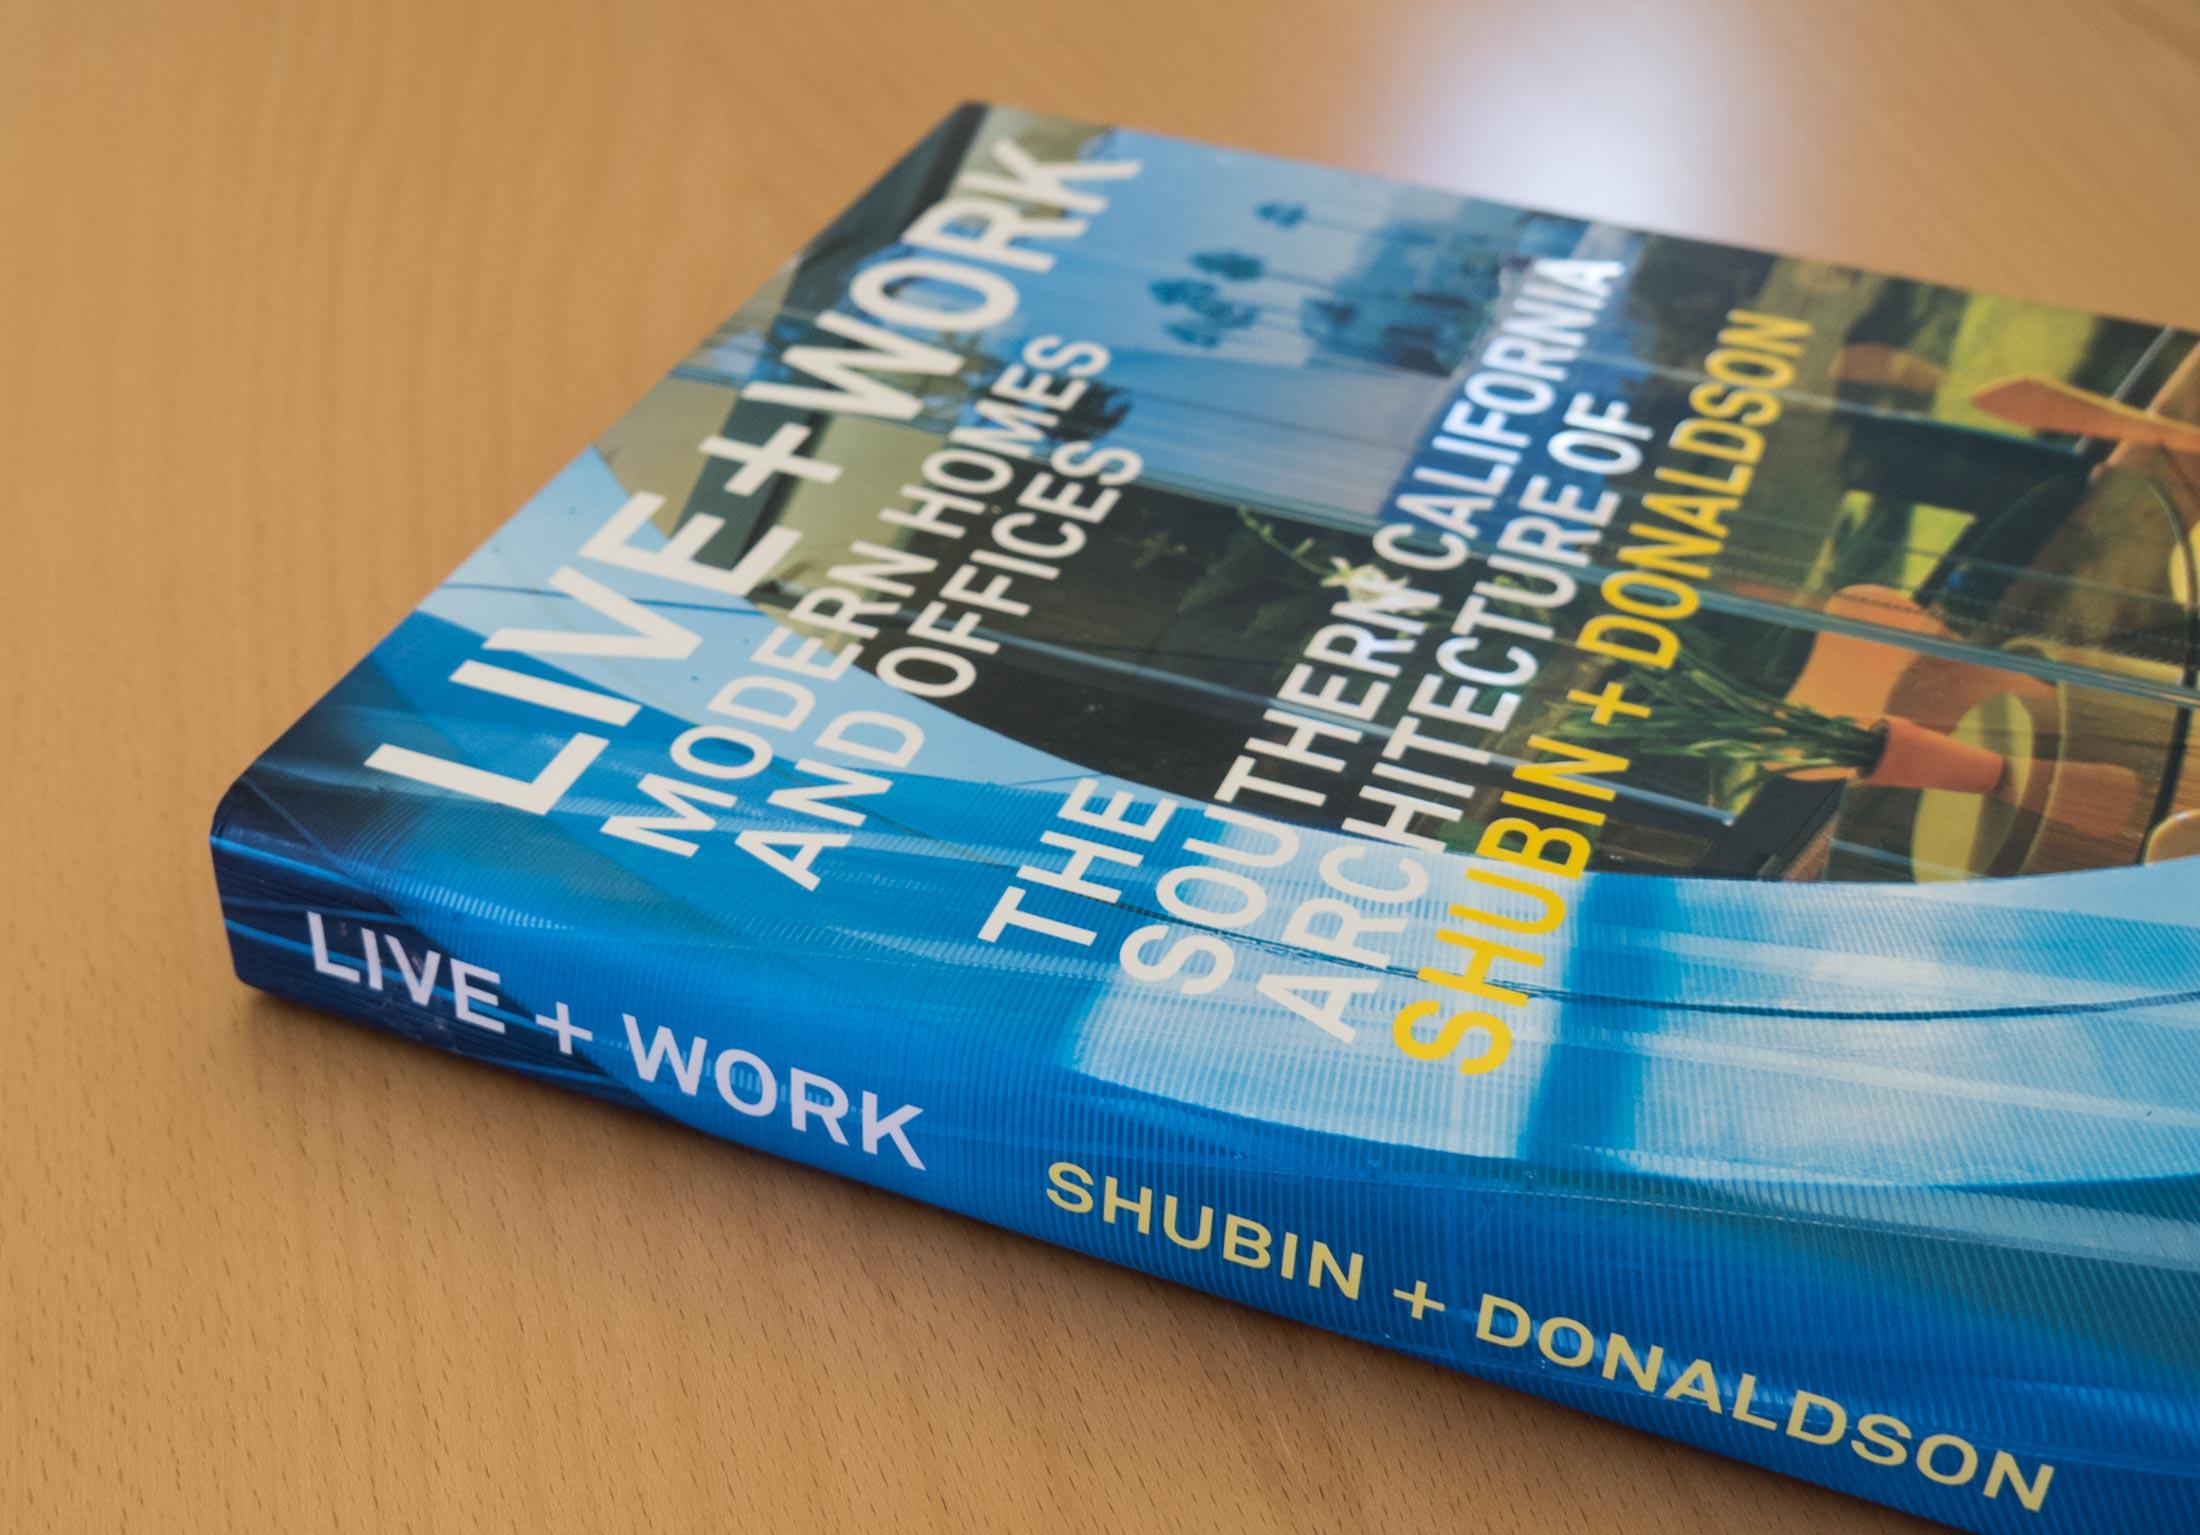 shubindonaldson-livework-cover-02